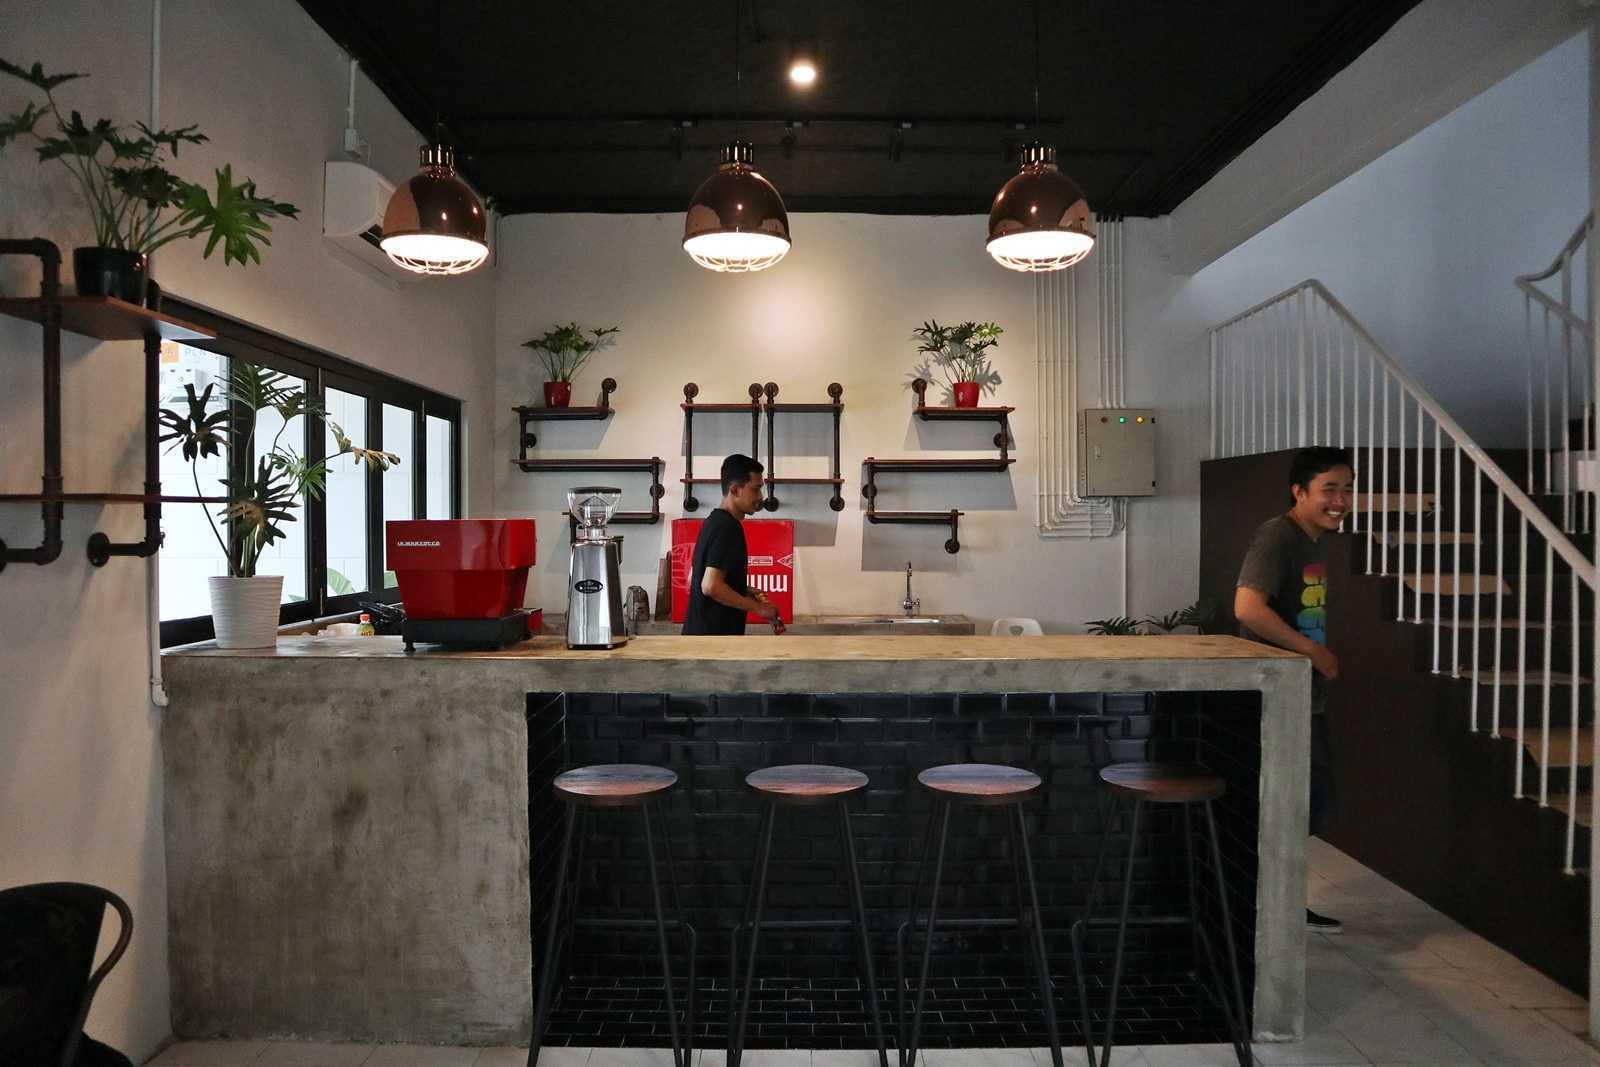 Bd Studio Tamoe Coffee & Resto Medan, Kota Medan, Sumatera Utara, Indonesia Medan, Kota Medan, Sumatera Utara, Indonesia Bd-Studio-Tamoe-Coffee-Resto  80737